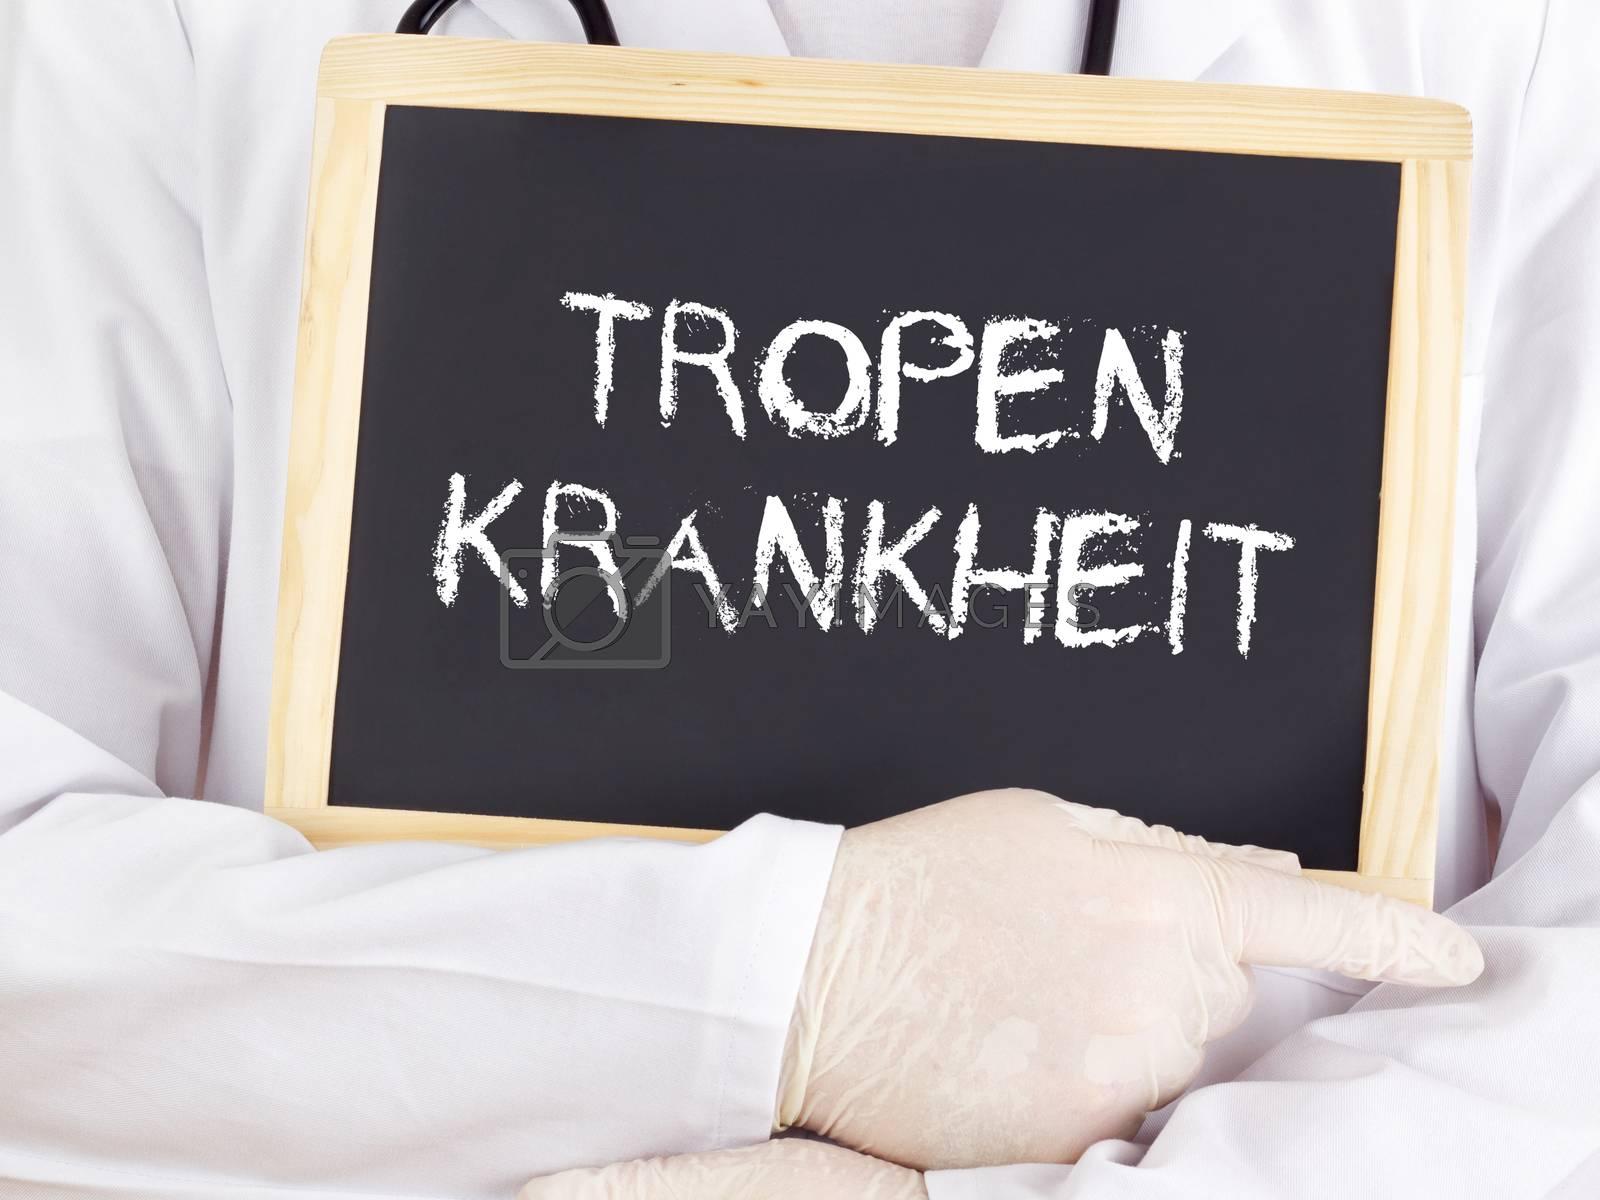 Doctor shows information: Tropical disease in german